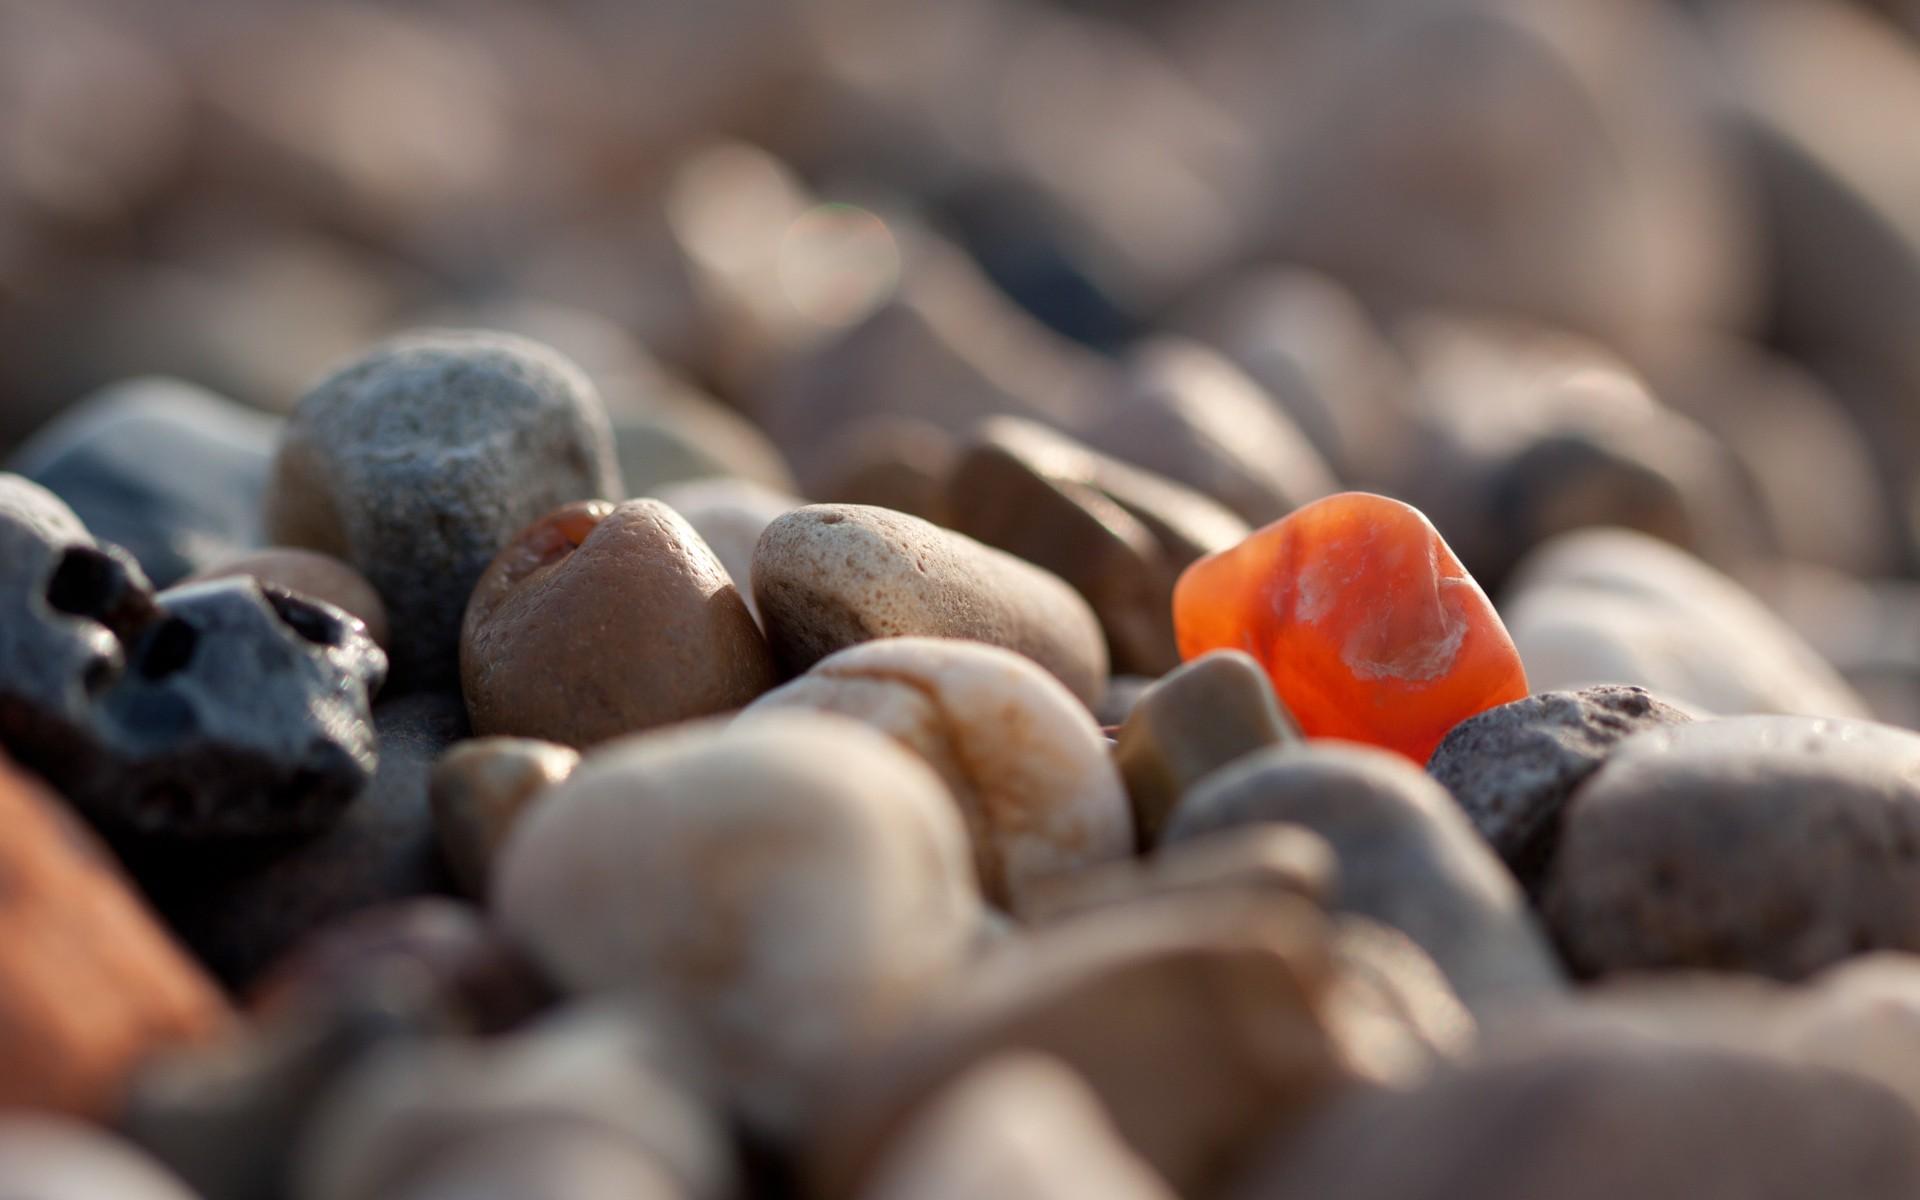 Nature stones macro pebbles depth of field wallpaper background